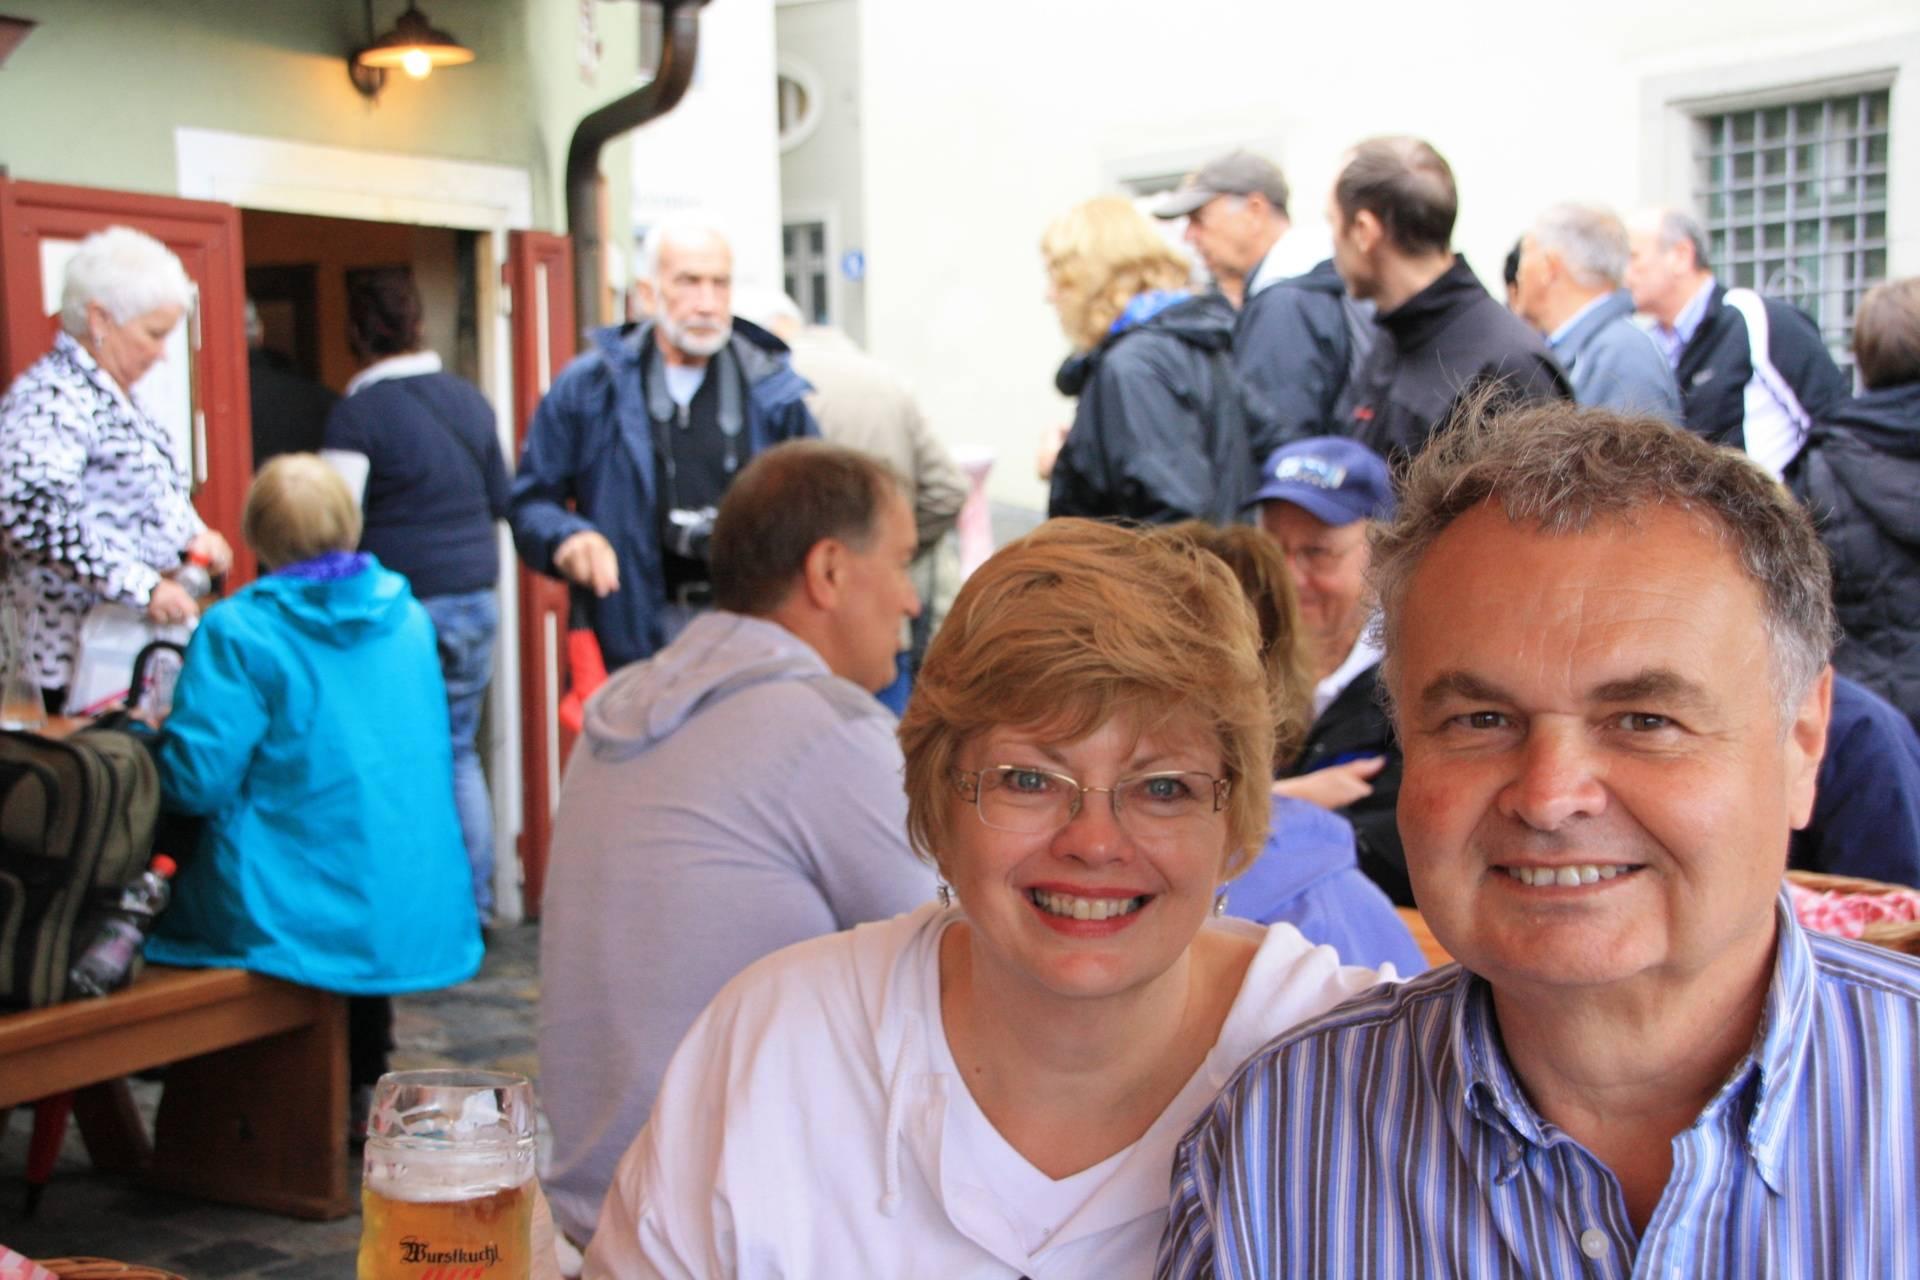 At Sausage Restaurant in Regensburg